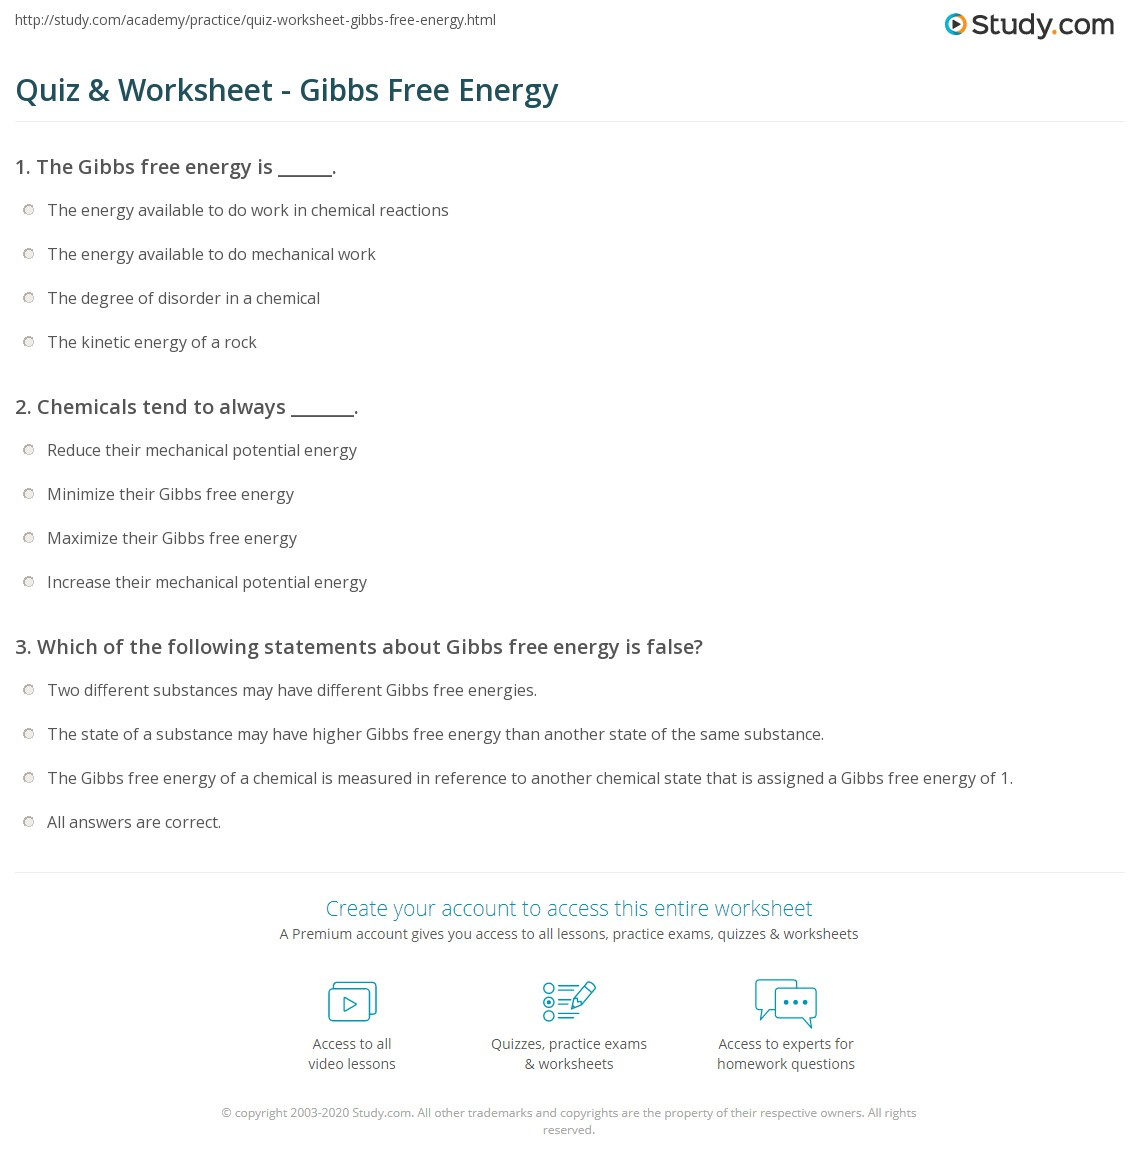 Quiz & Worksheet - Gibbs Free Energy | Study.com